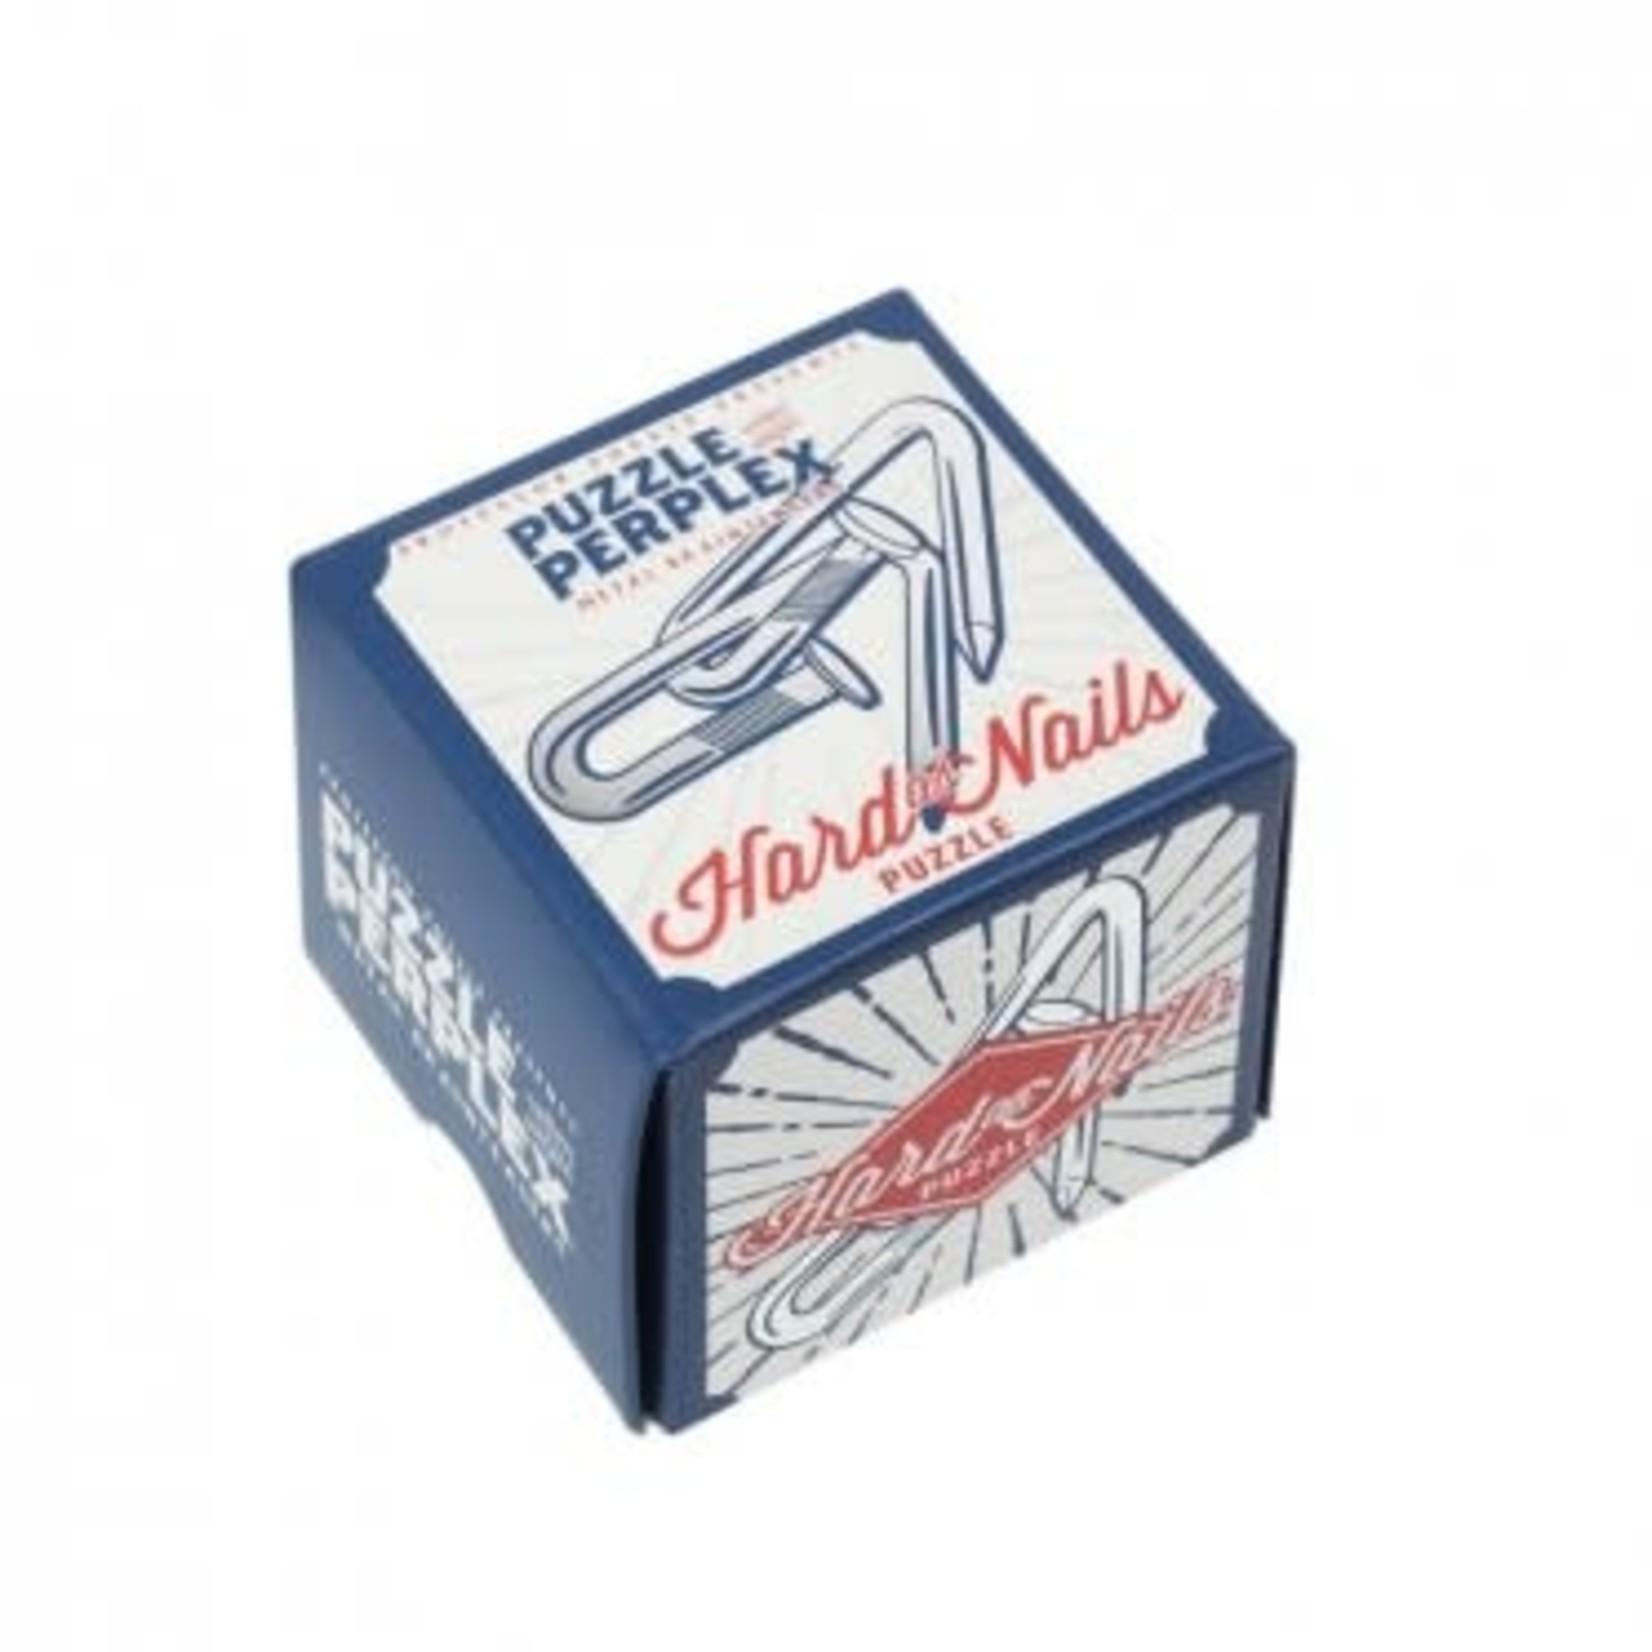 Professor Puzzle Puzzle & Perplex Puzzlebox - Hard as Nails